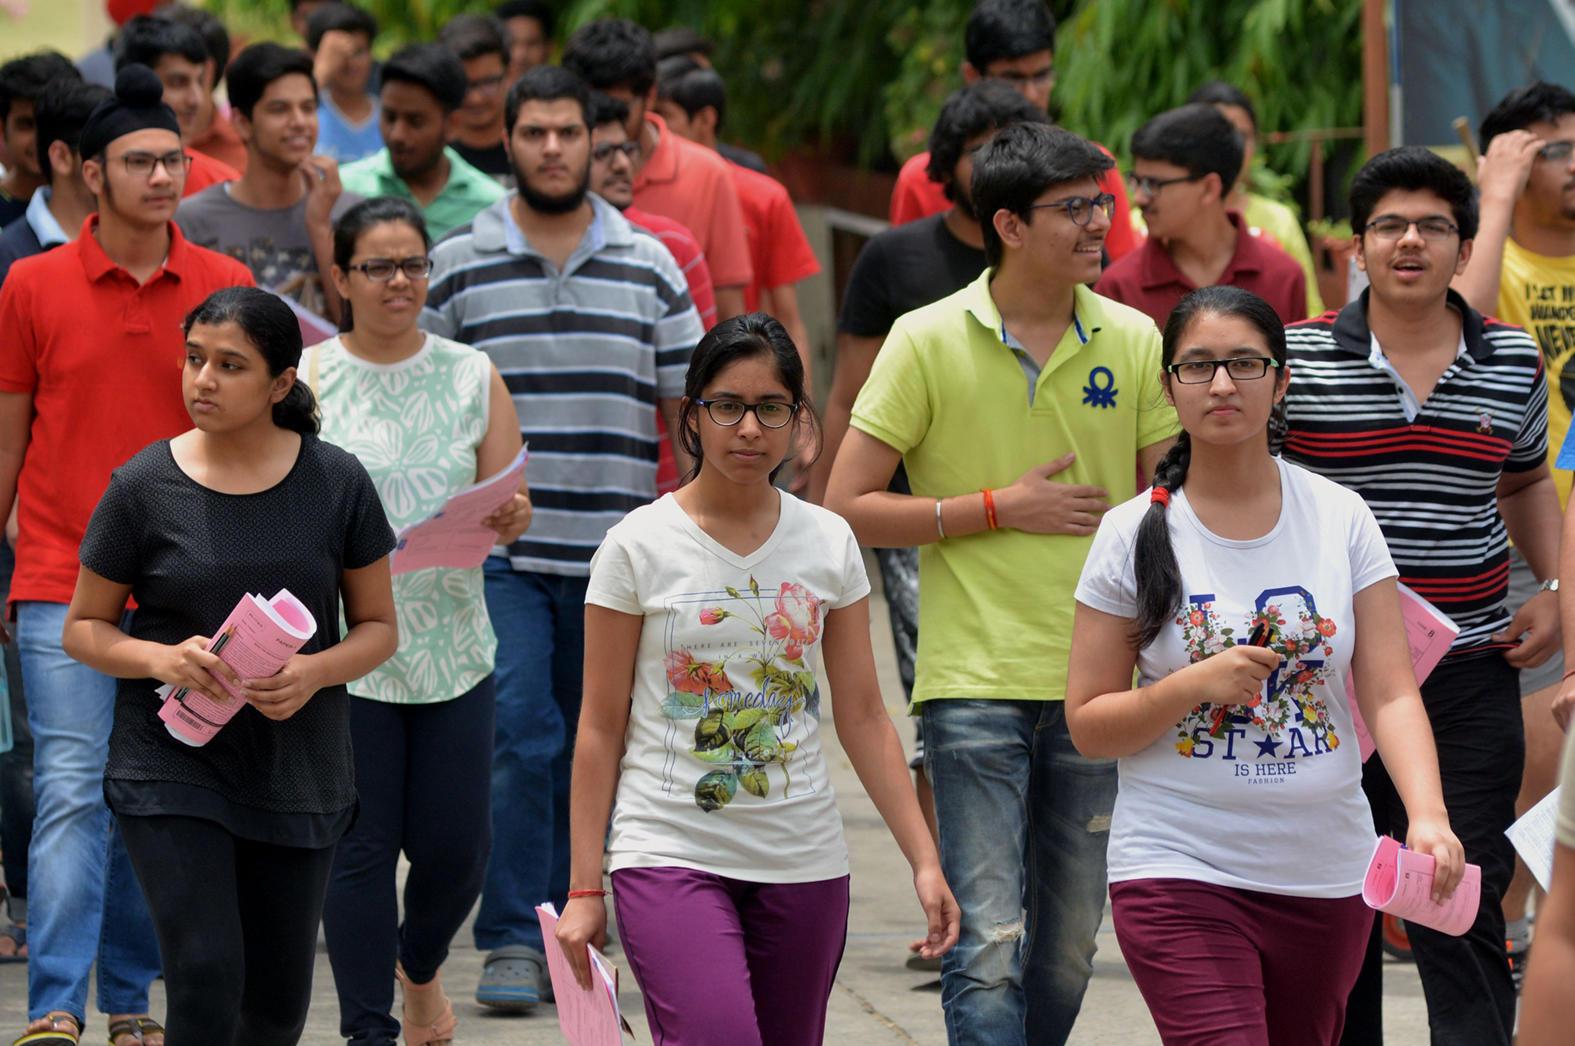 Cracking UPSC exam requires hardwork and intelligence